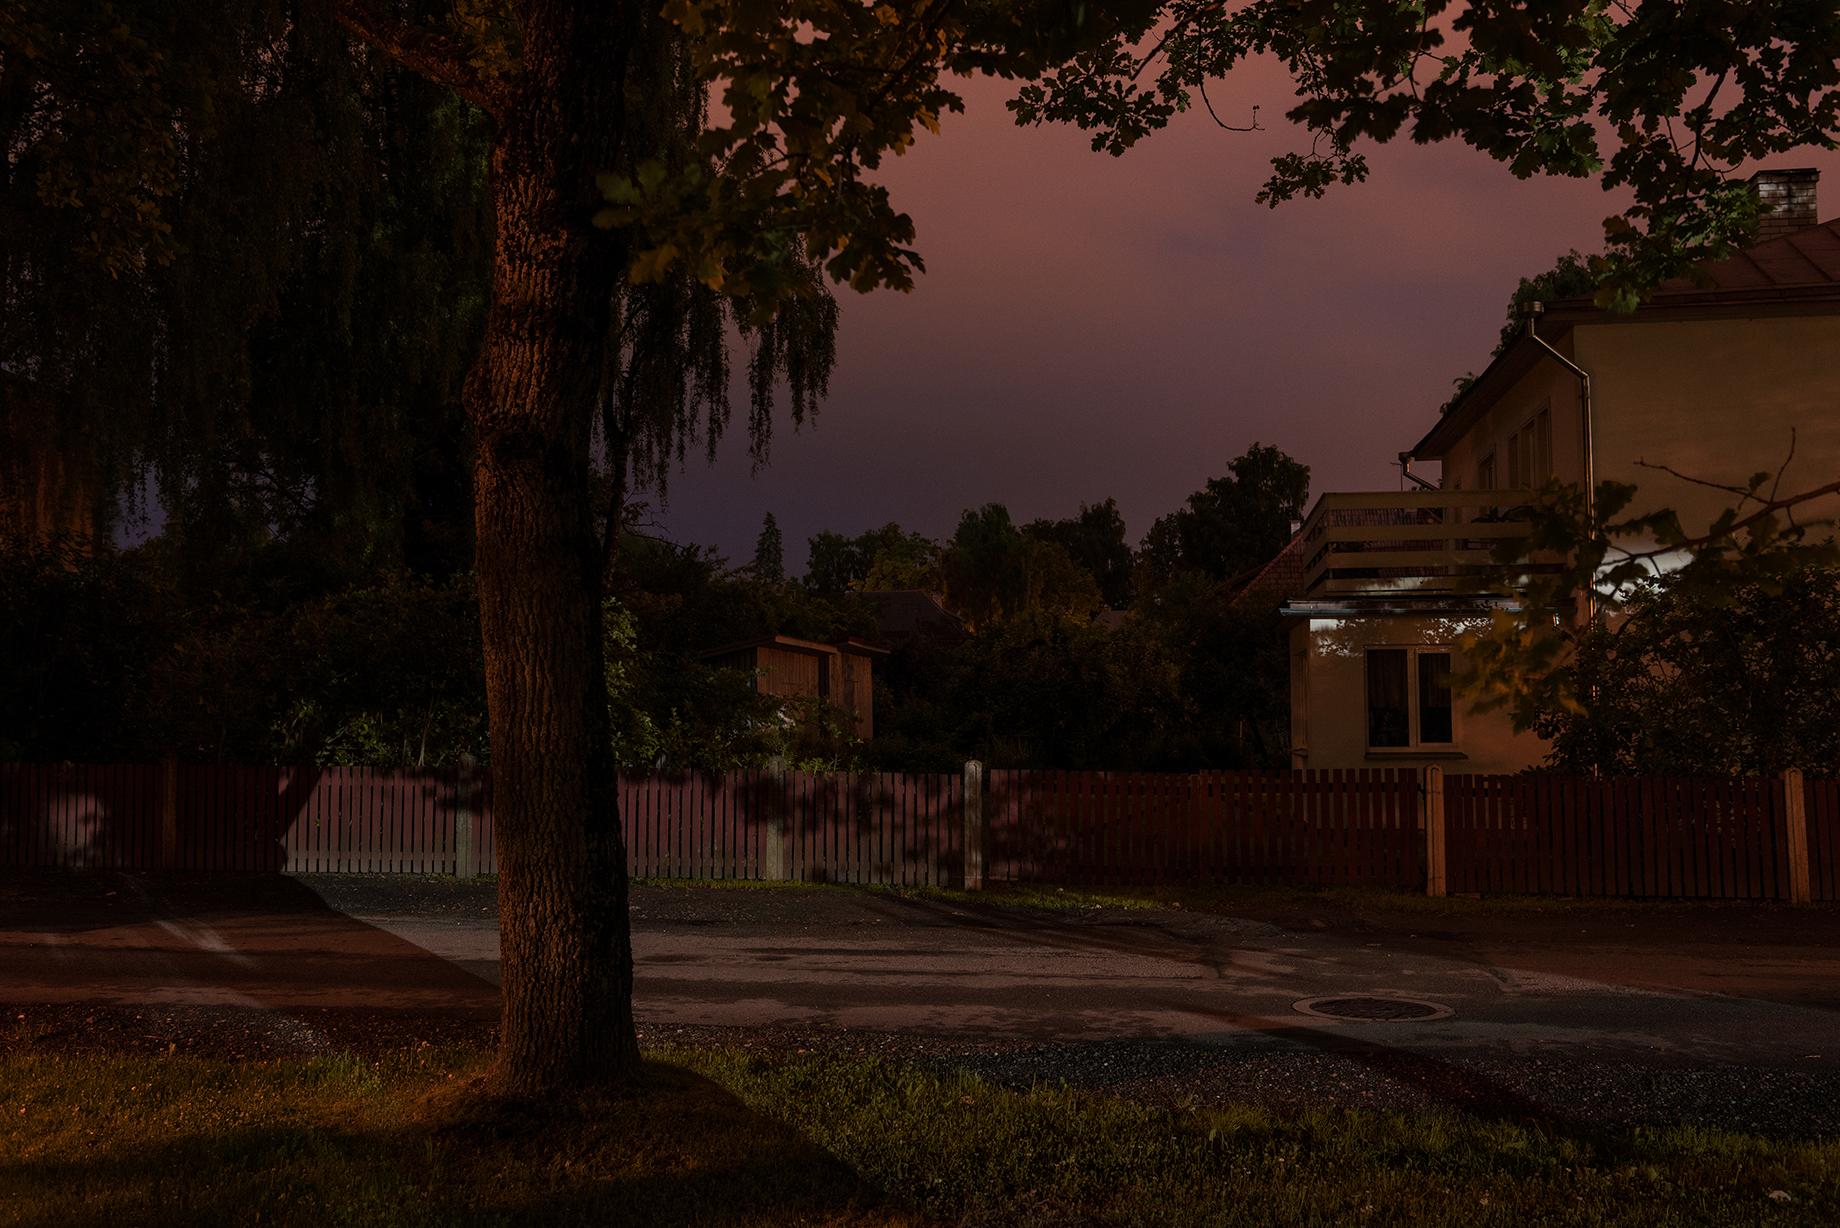 July Night on an Avenue